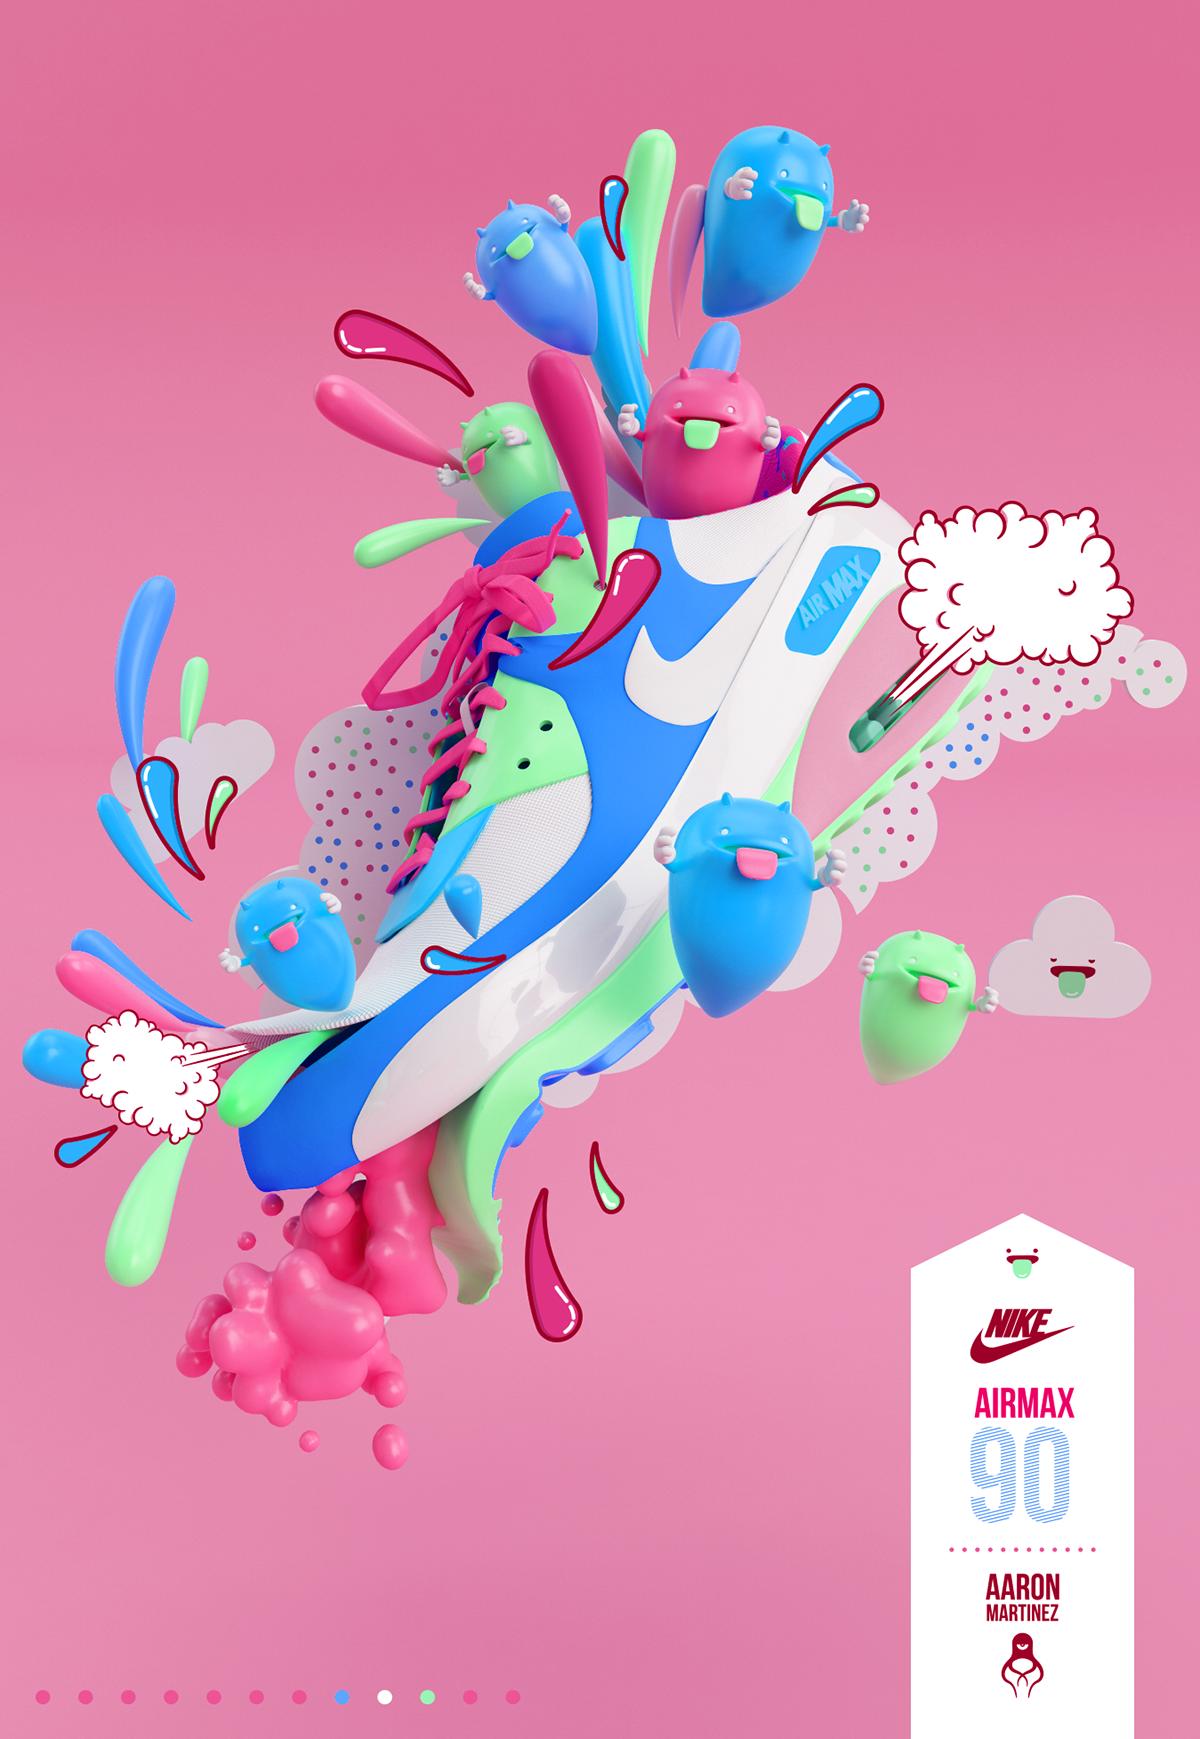 Nike | Nike Air Max 90 Essential Cream Turquoise | AJ1285